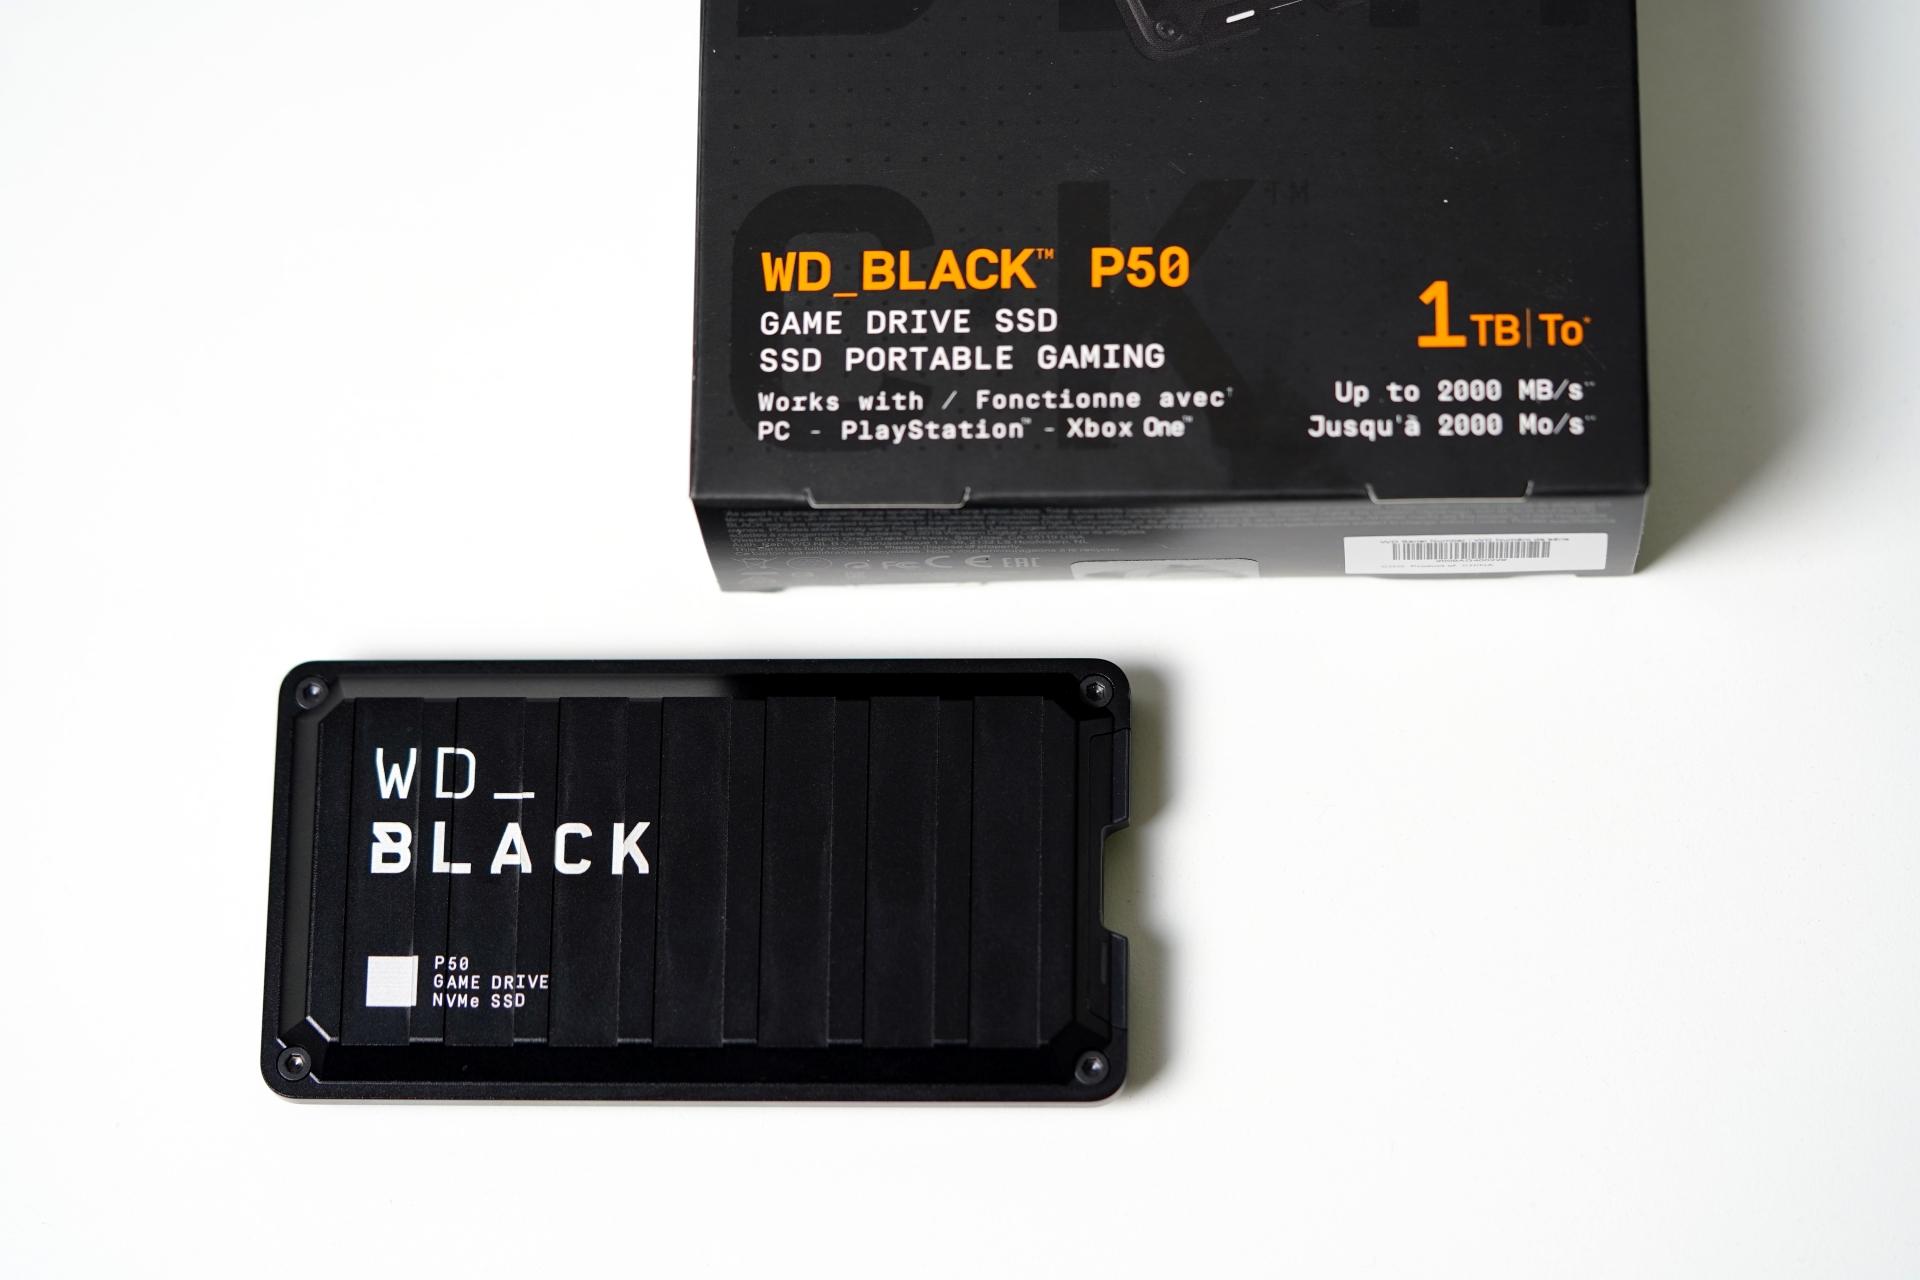 WD_BLACK P50 1 TB